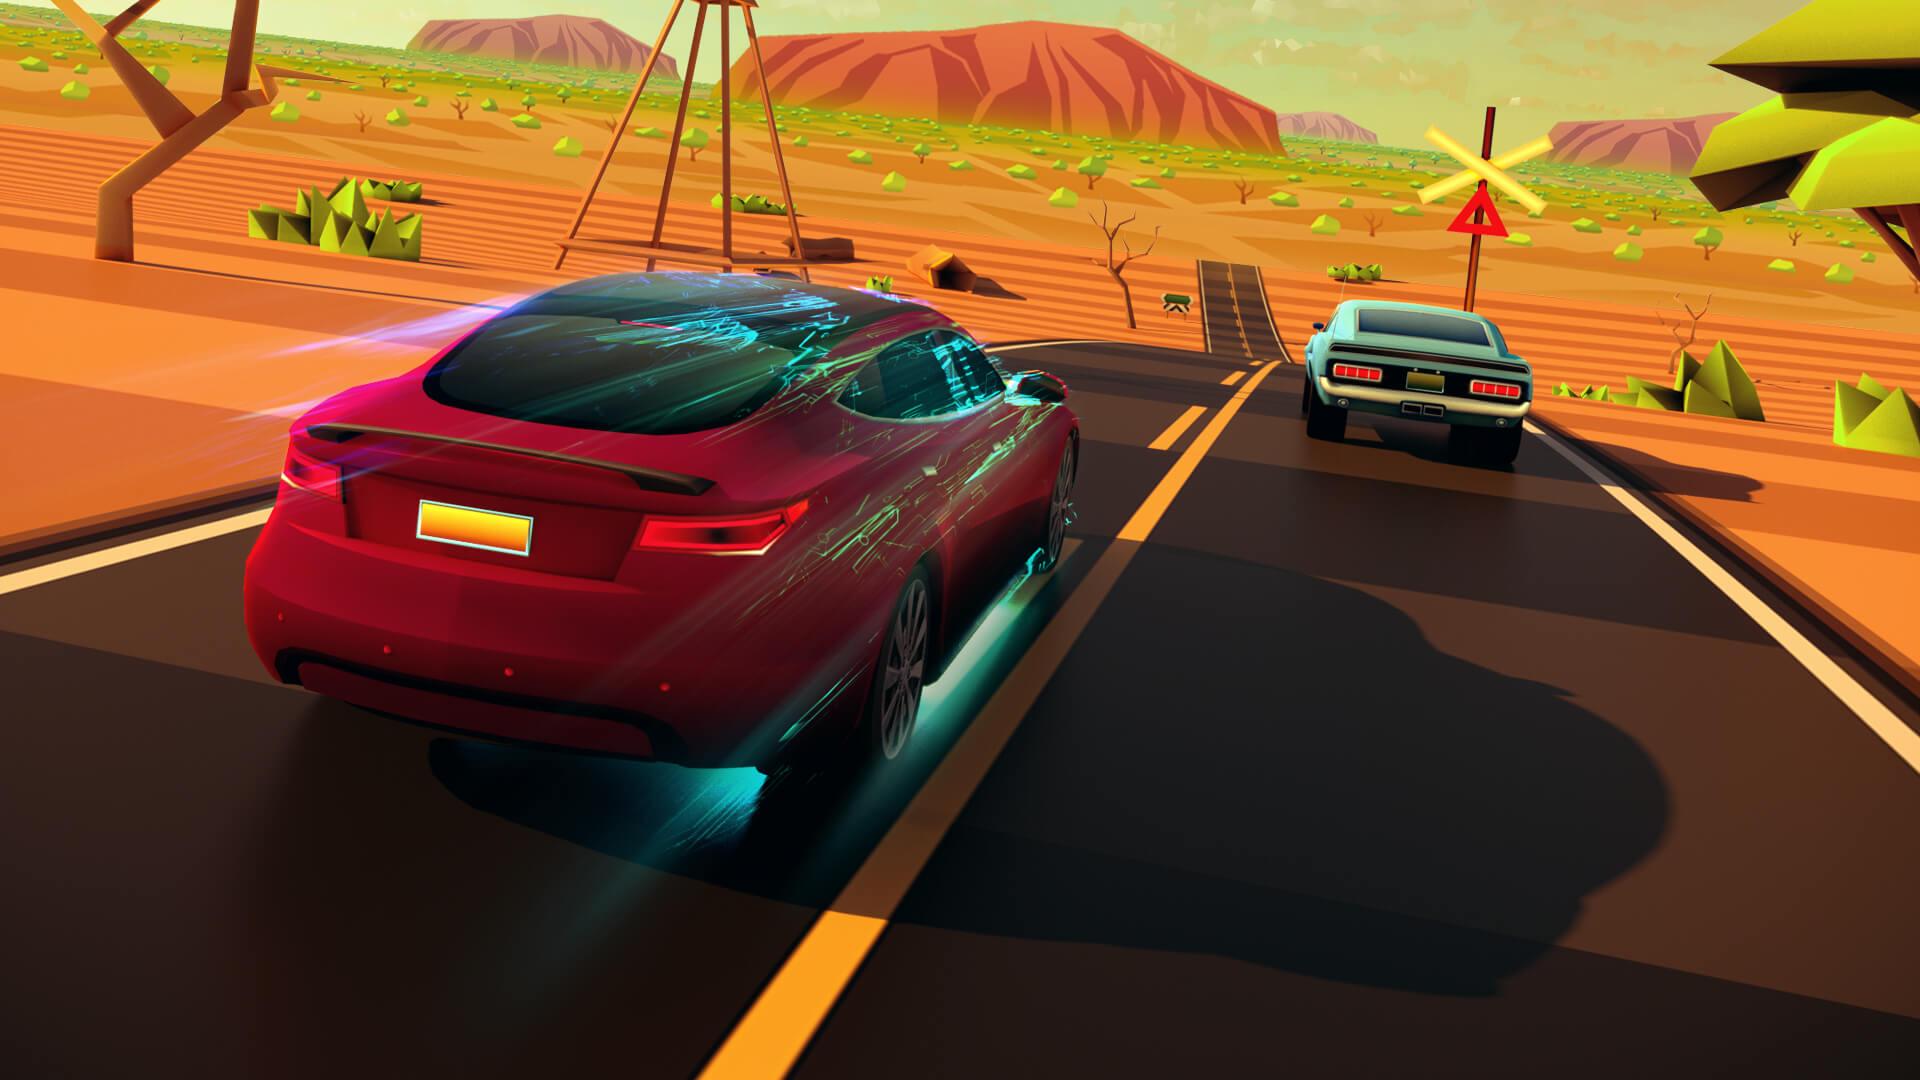 Görsel 3: Horizon Chase Turbo Sistem Gereksinimleri - Sistem Gereksinimleri - Pilli Oyun